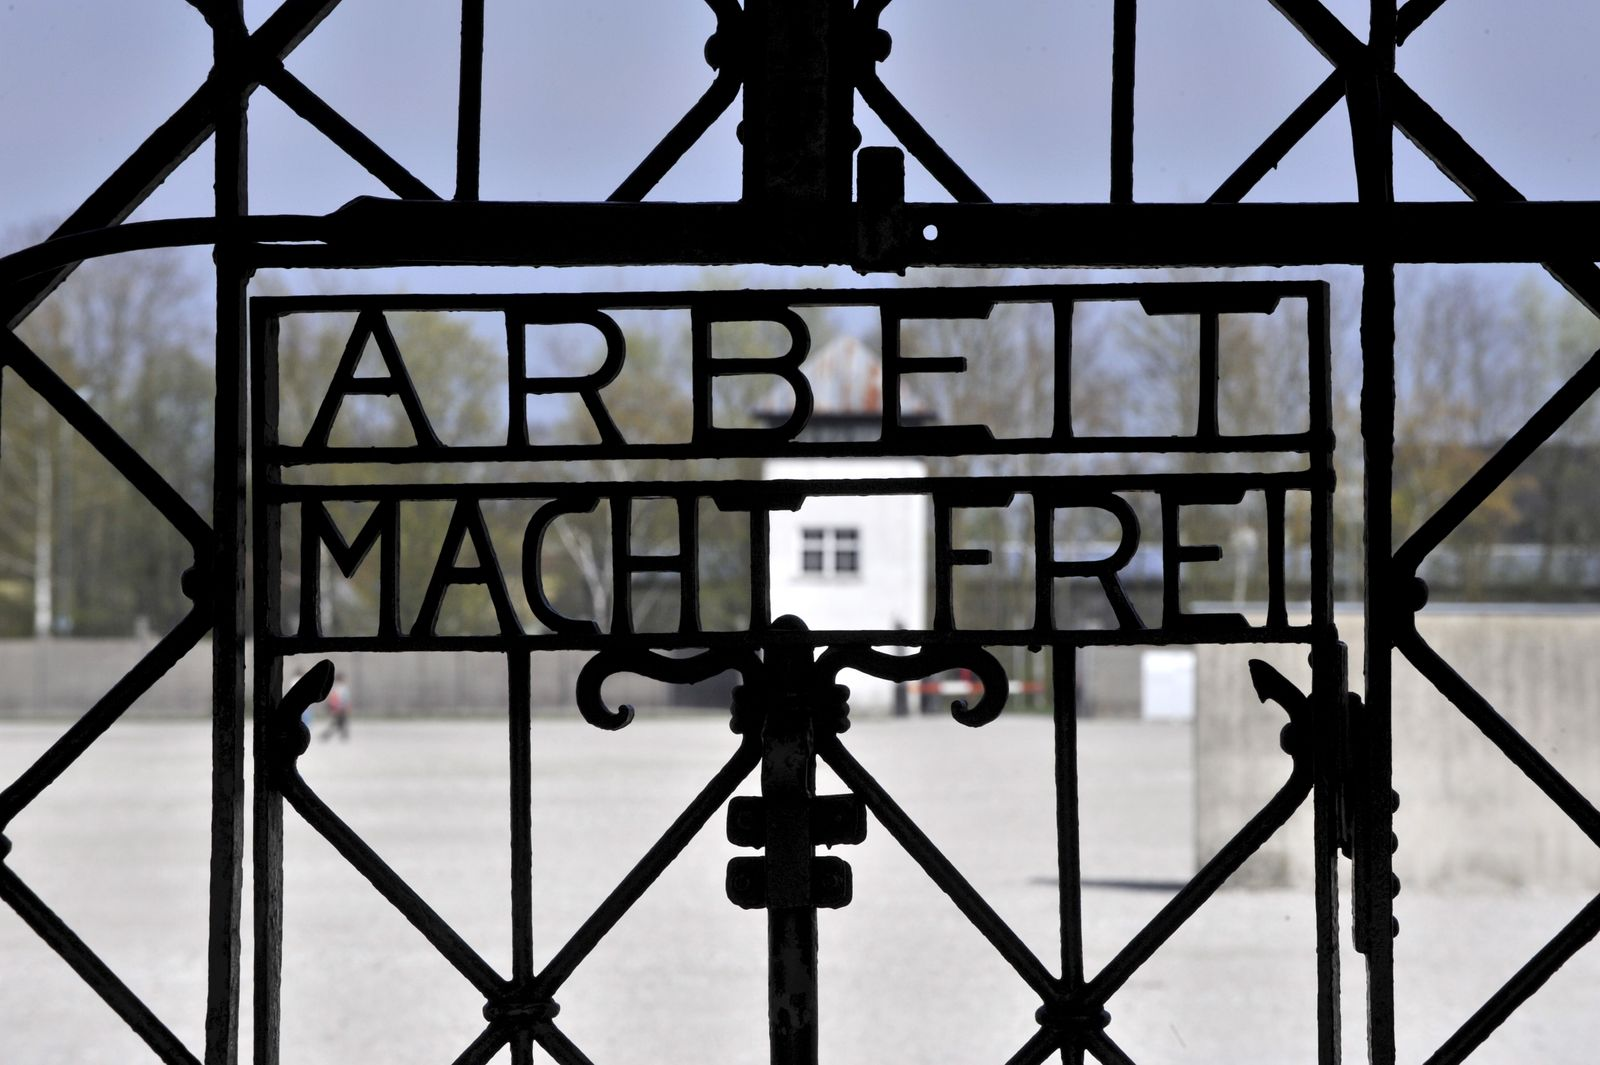 Ehemaliges Konzentrationslager Dachau